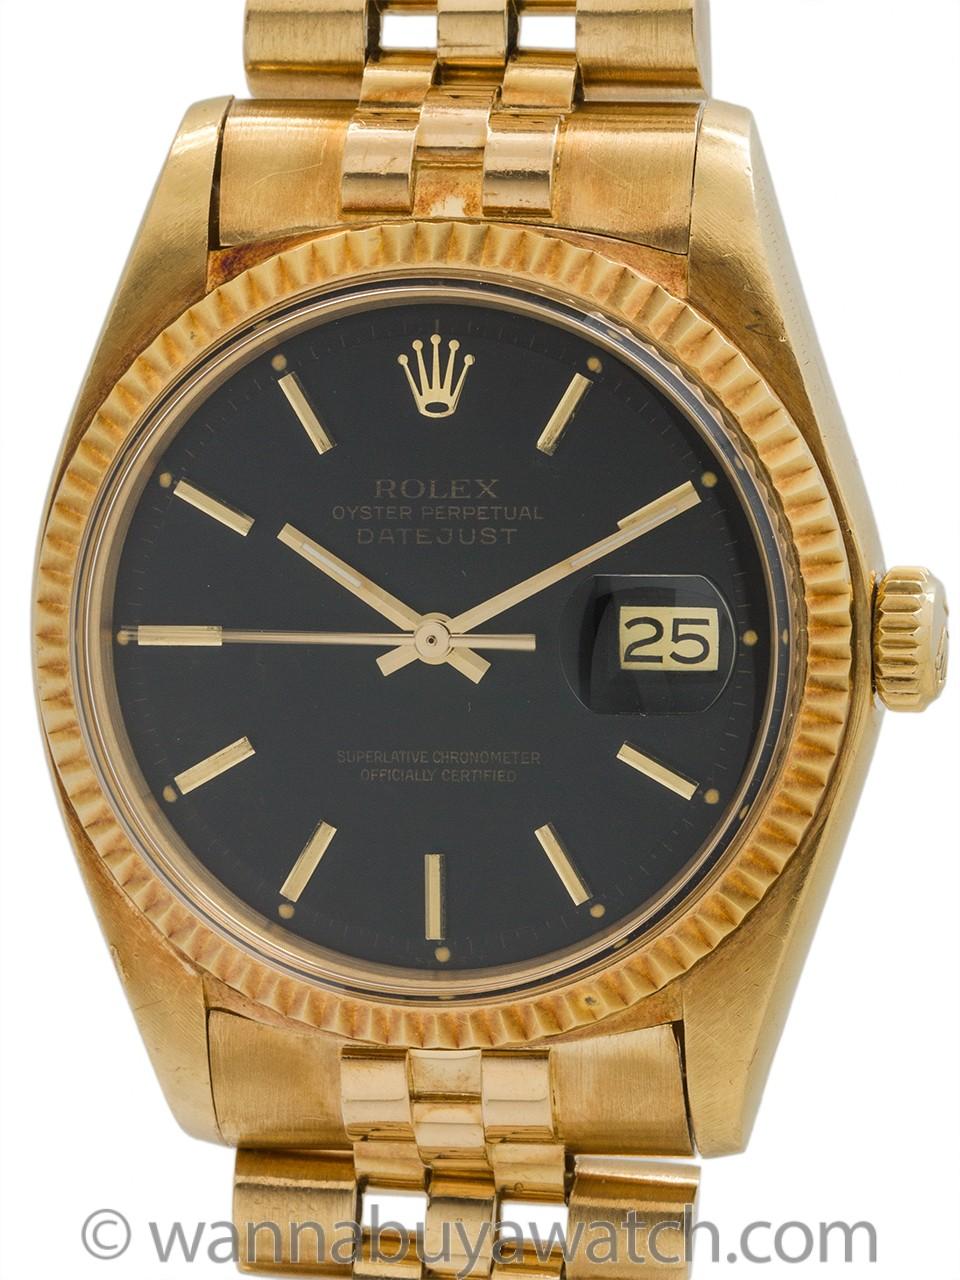 Rolex Datejust ref 1601 18K YG Black Dial circa 1977